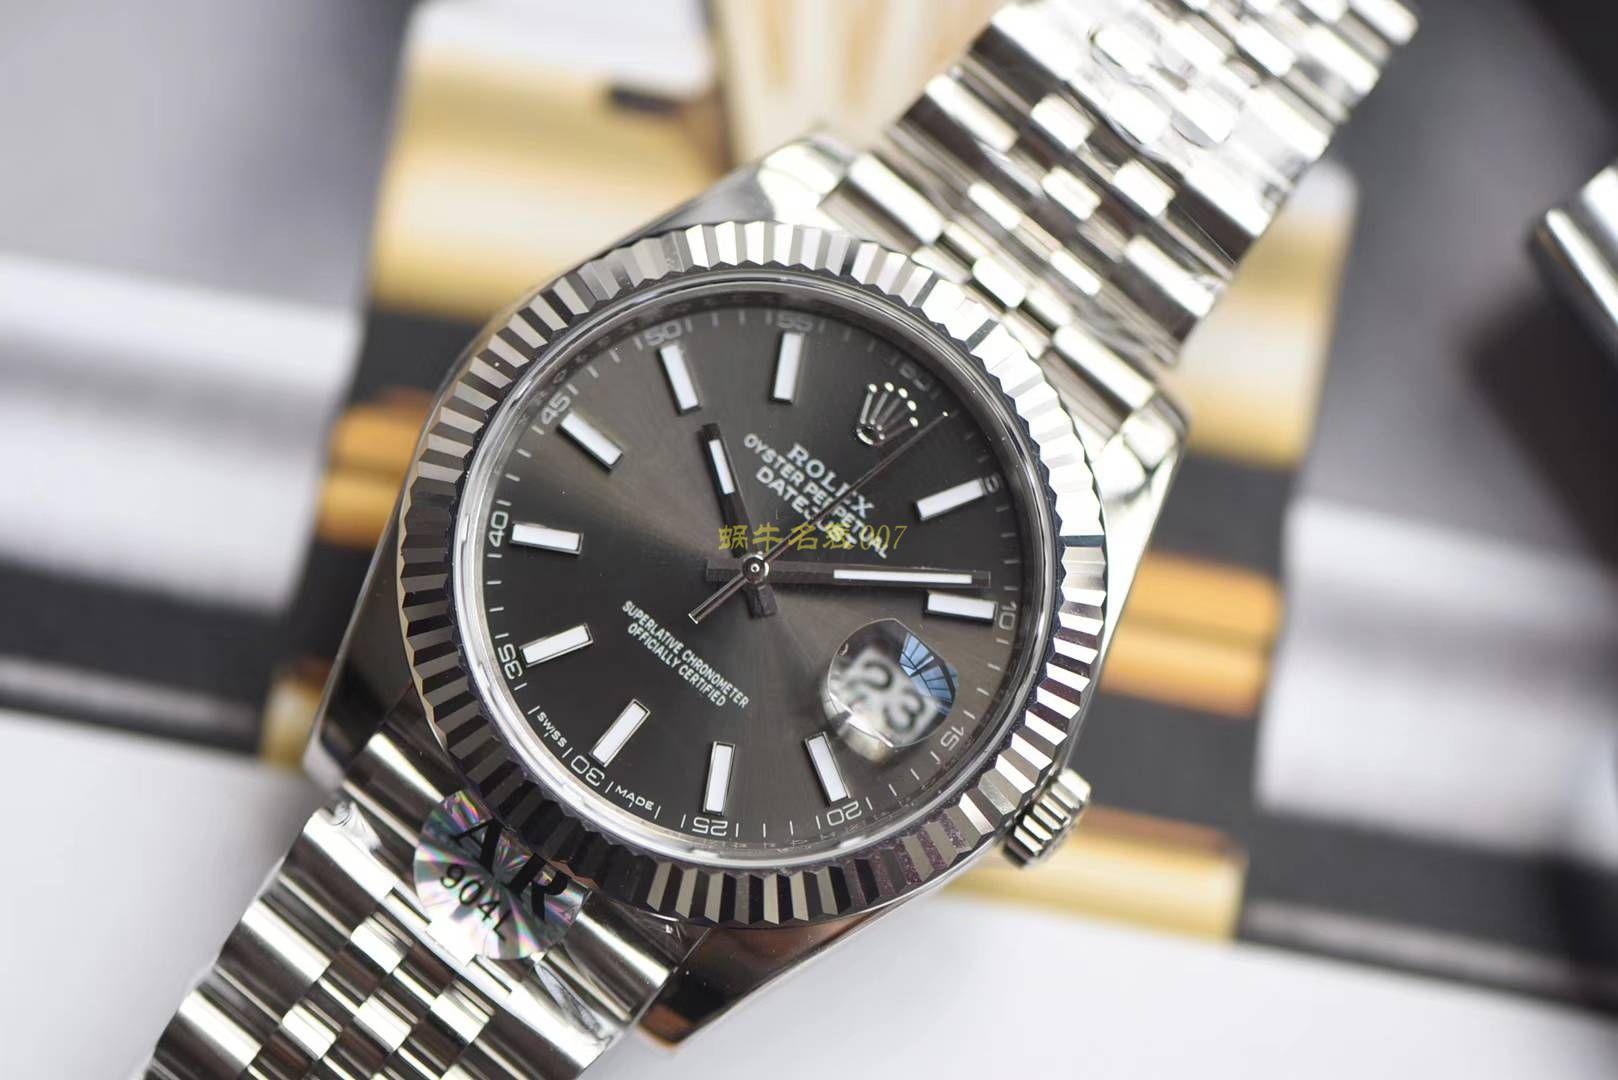 【AR一比一超A克隆手表】劳力士日志型DATEJUST系列126334腕表904钢 / R253